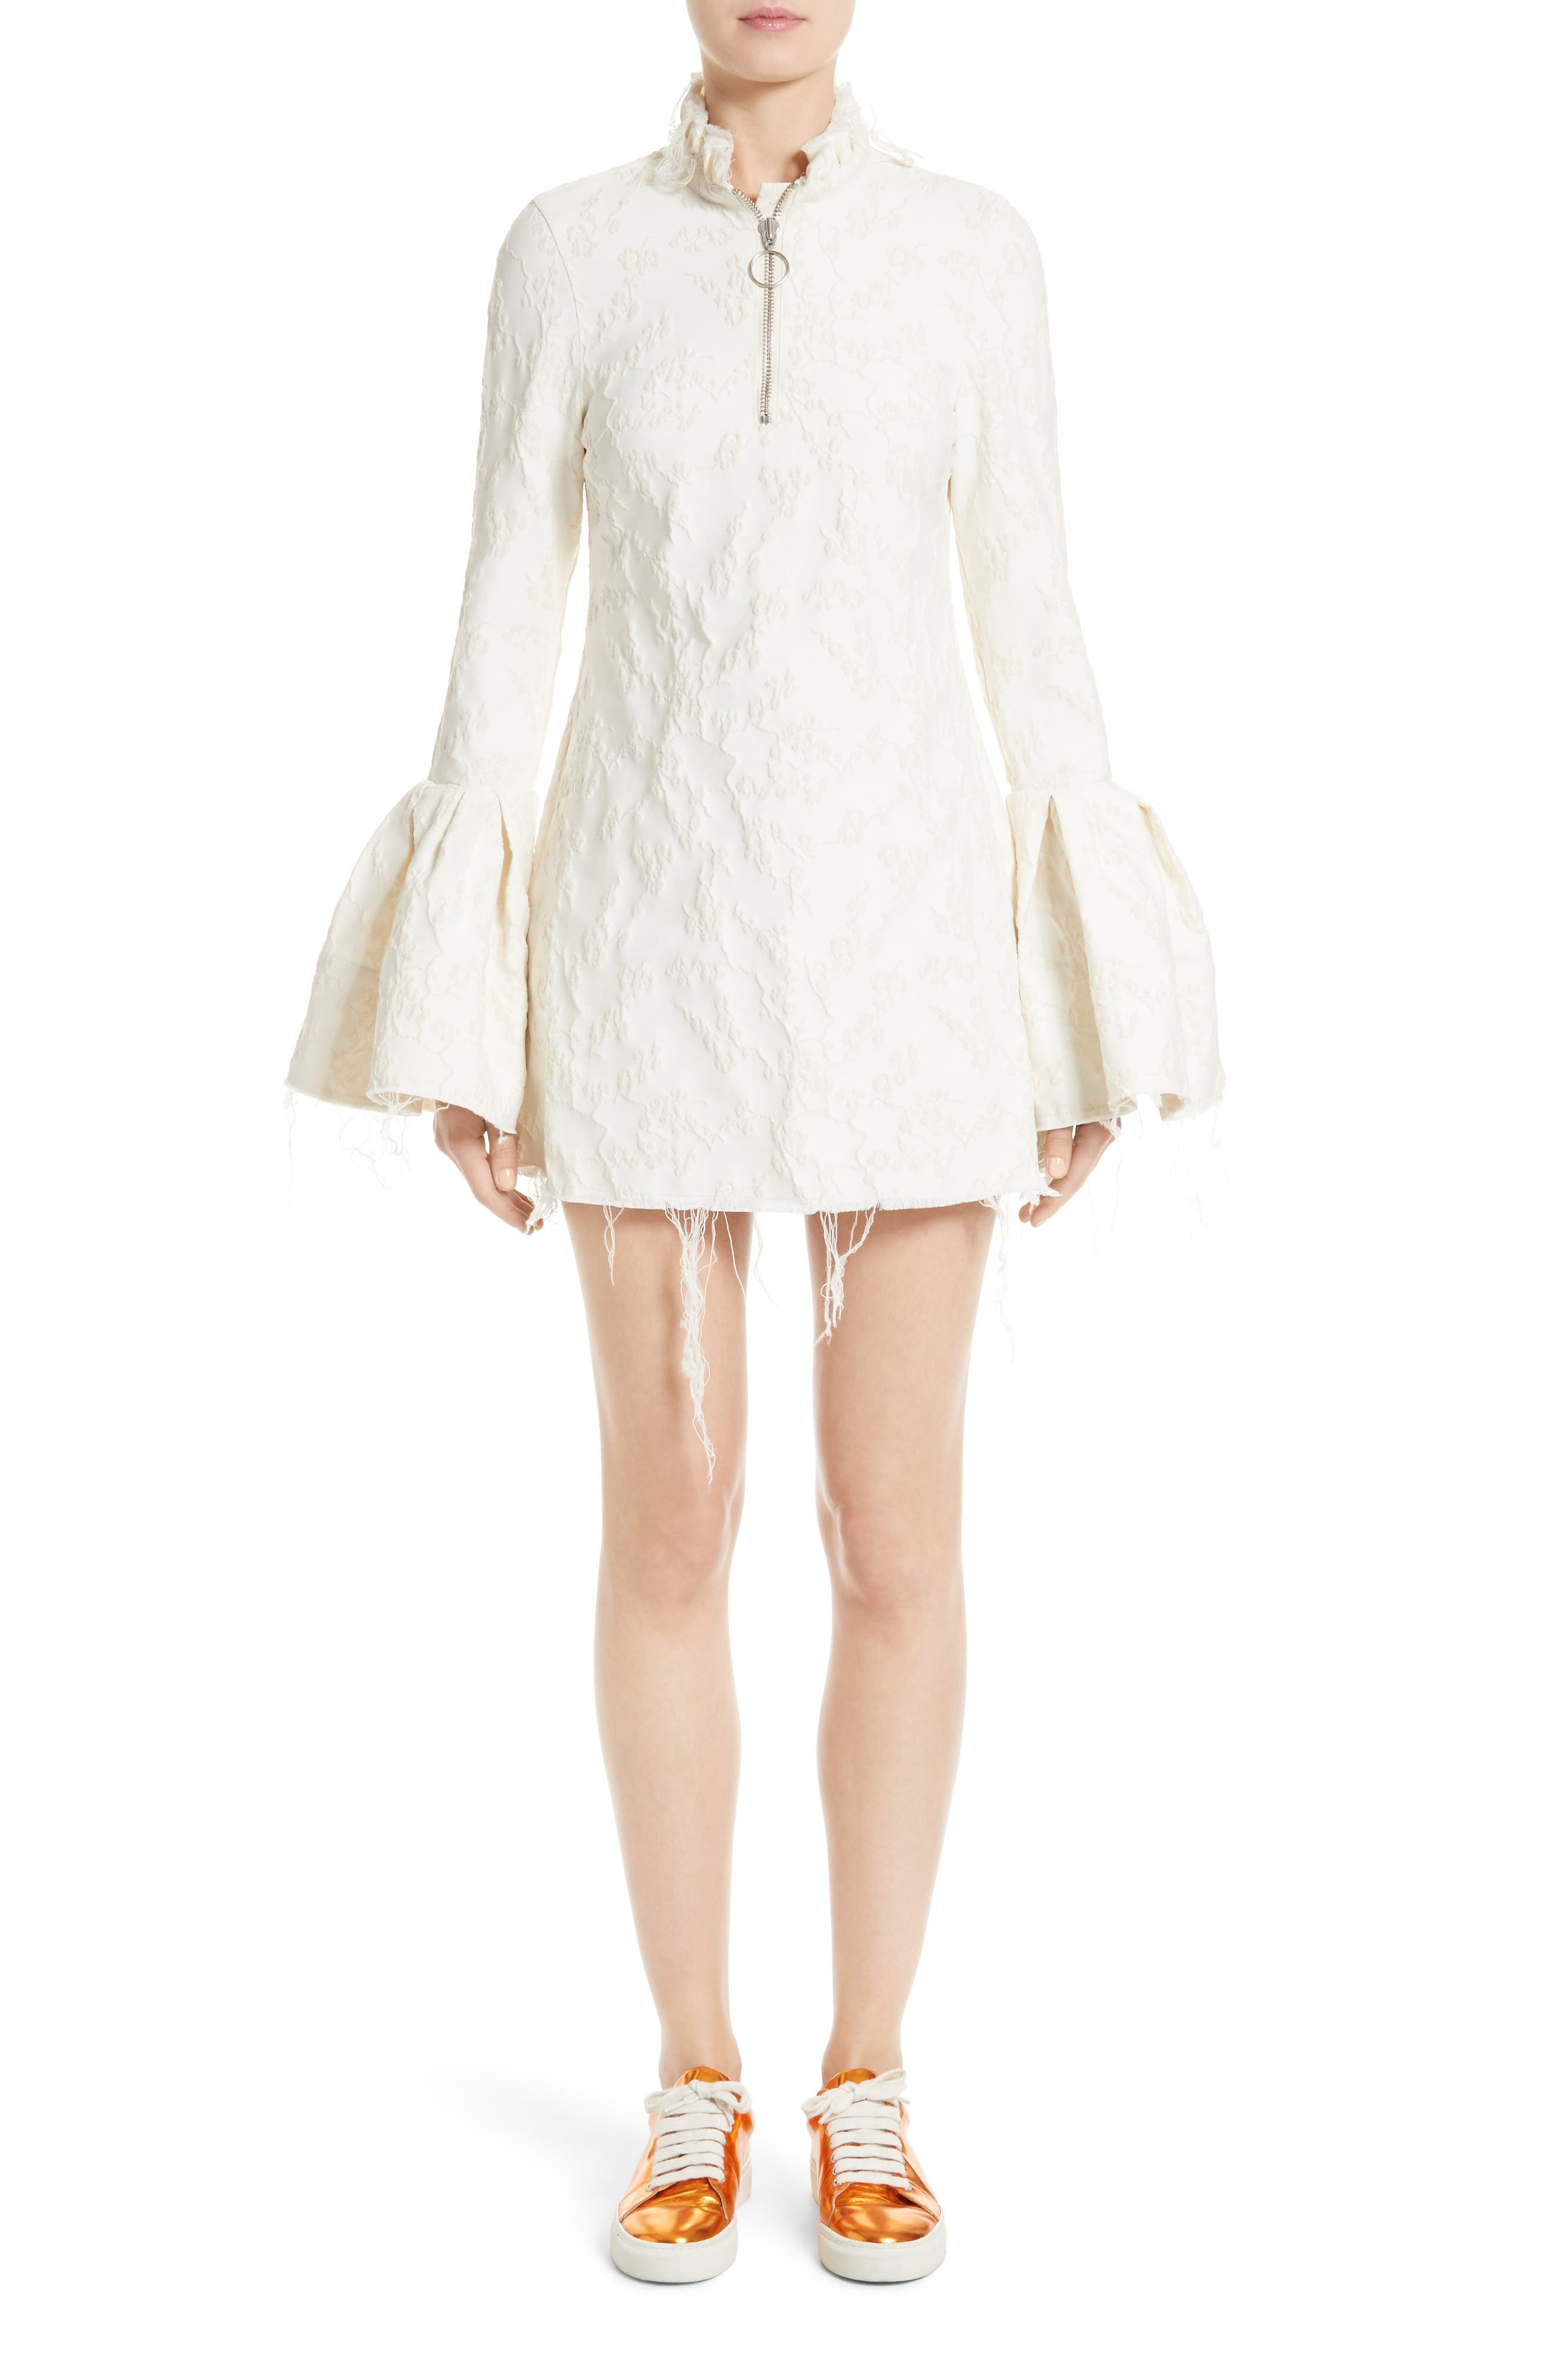 Alternate Image 1 Selected - Marques'Almeida Bell Sleeve Minidress